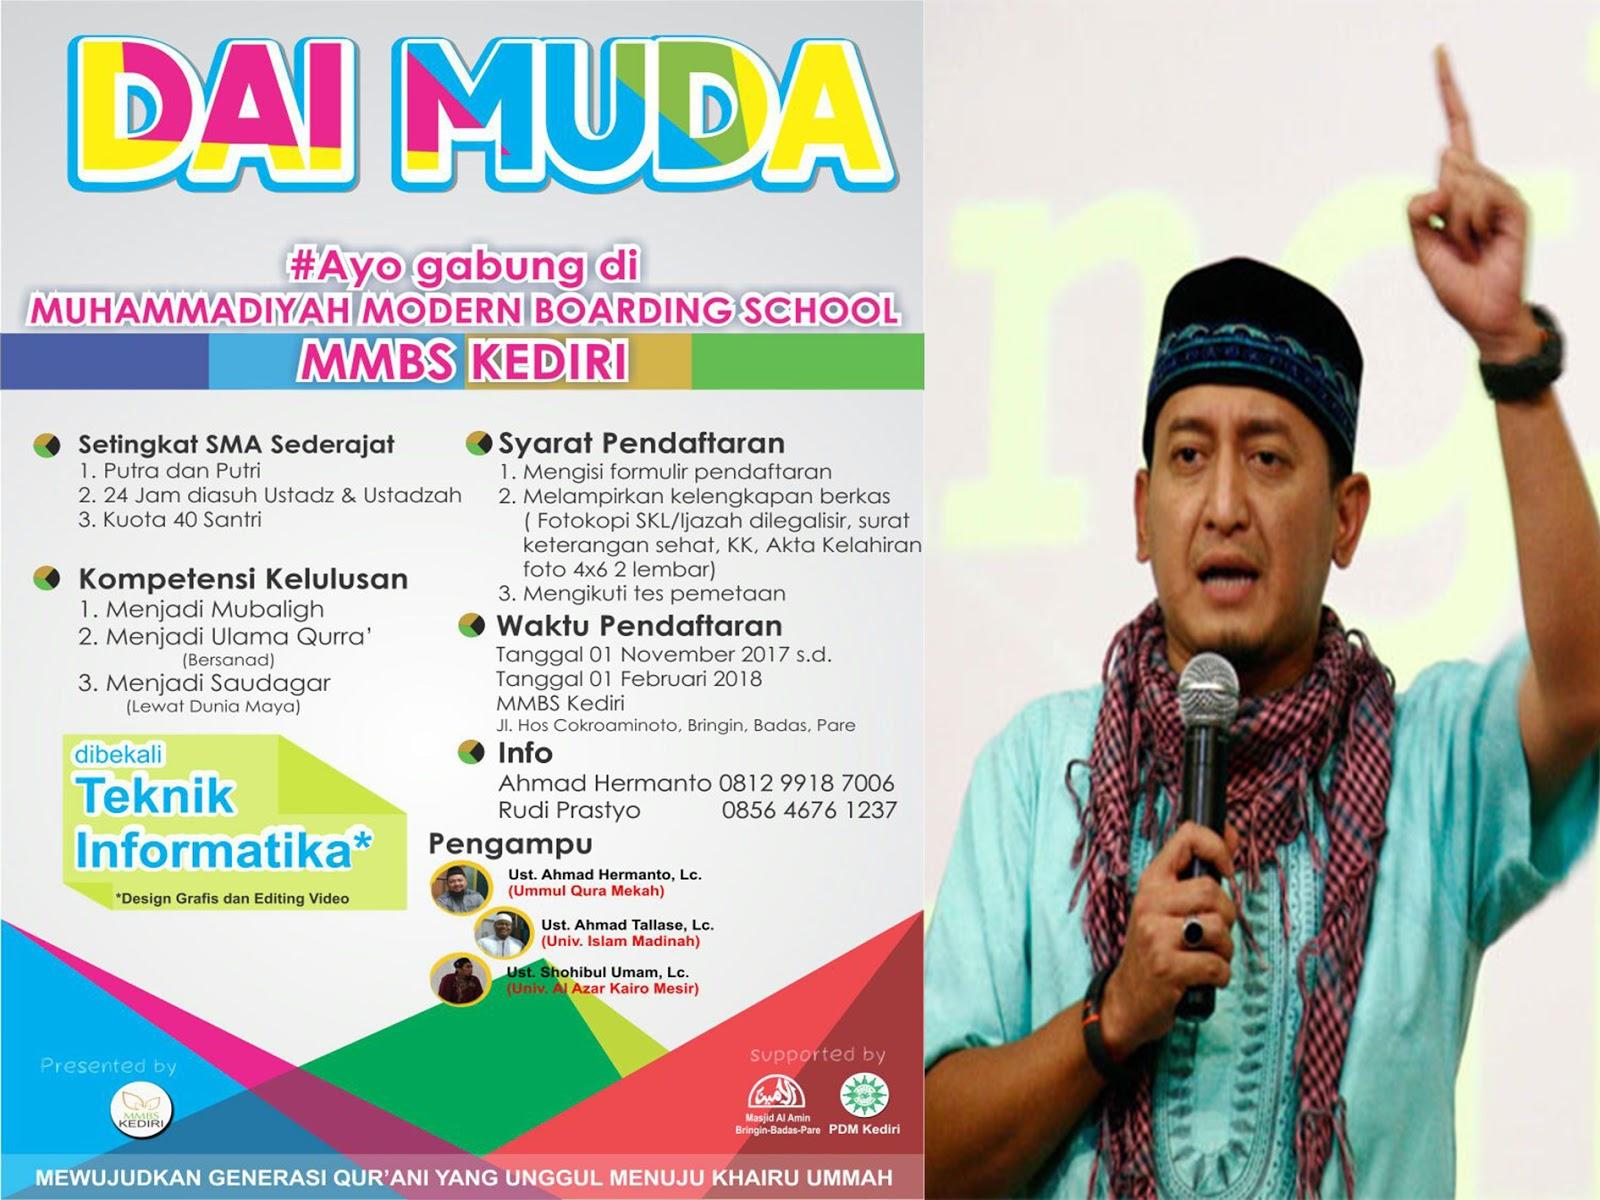 Muhammadiyah modern Boarding School